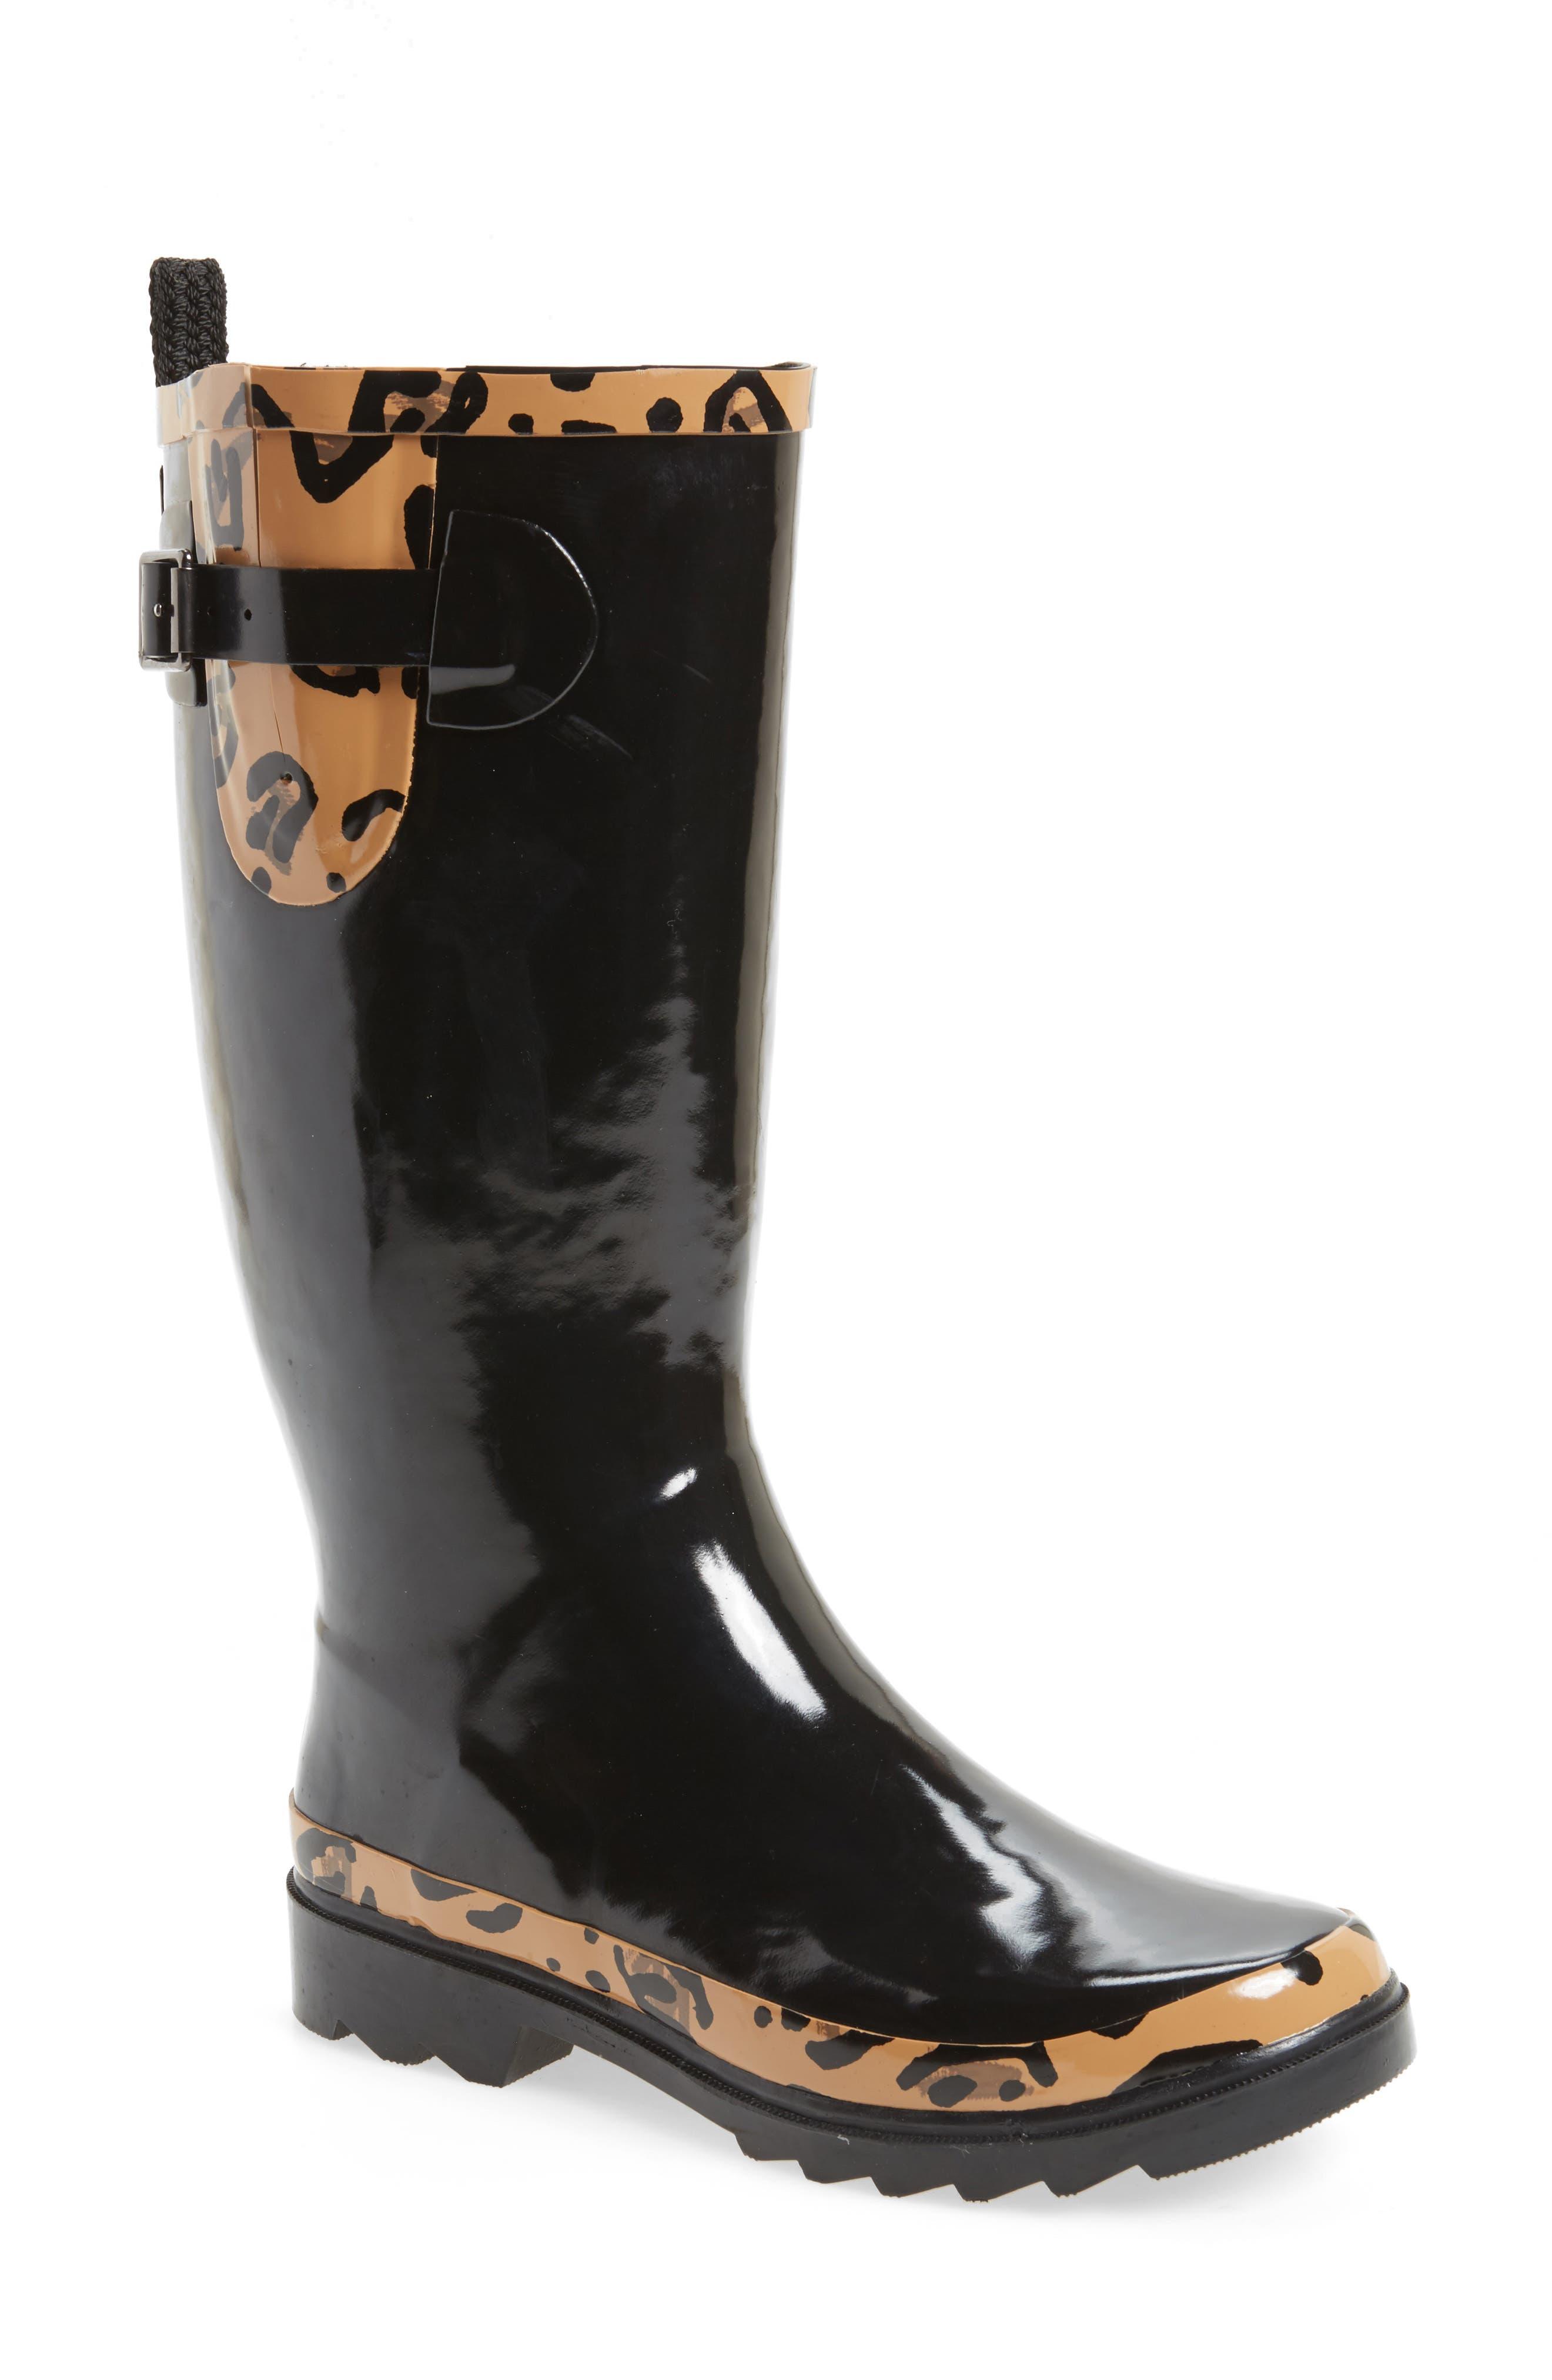 SAKROOTS, Rhythm Waterproof Rain Boot, Main thumbnail 1, color, BLACK LEOPARD PRINT